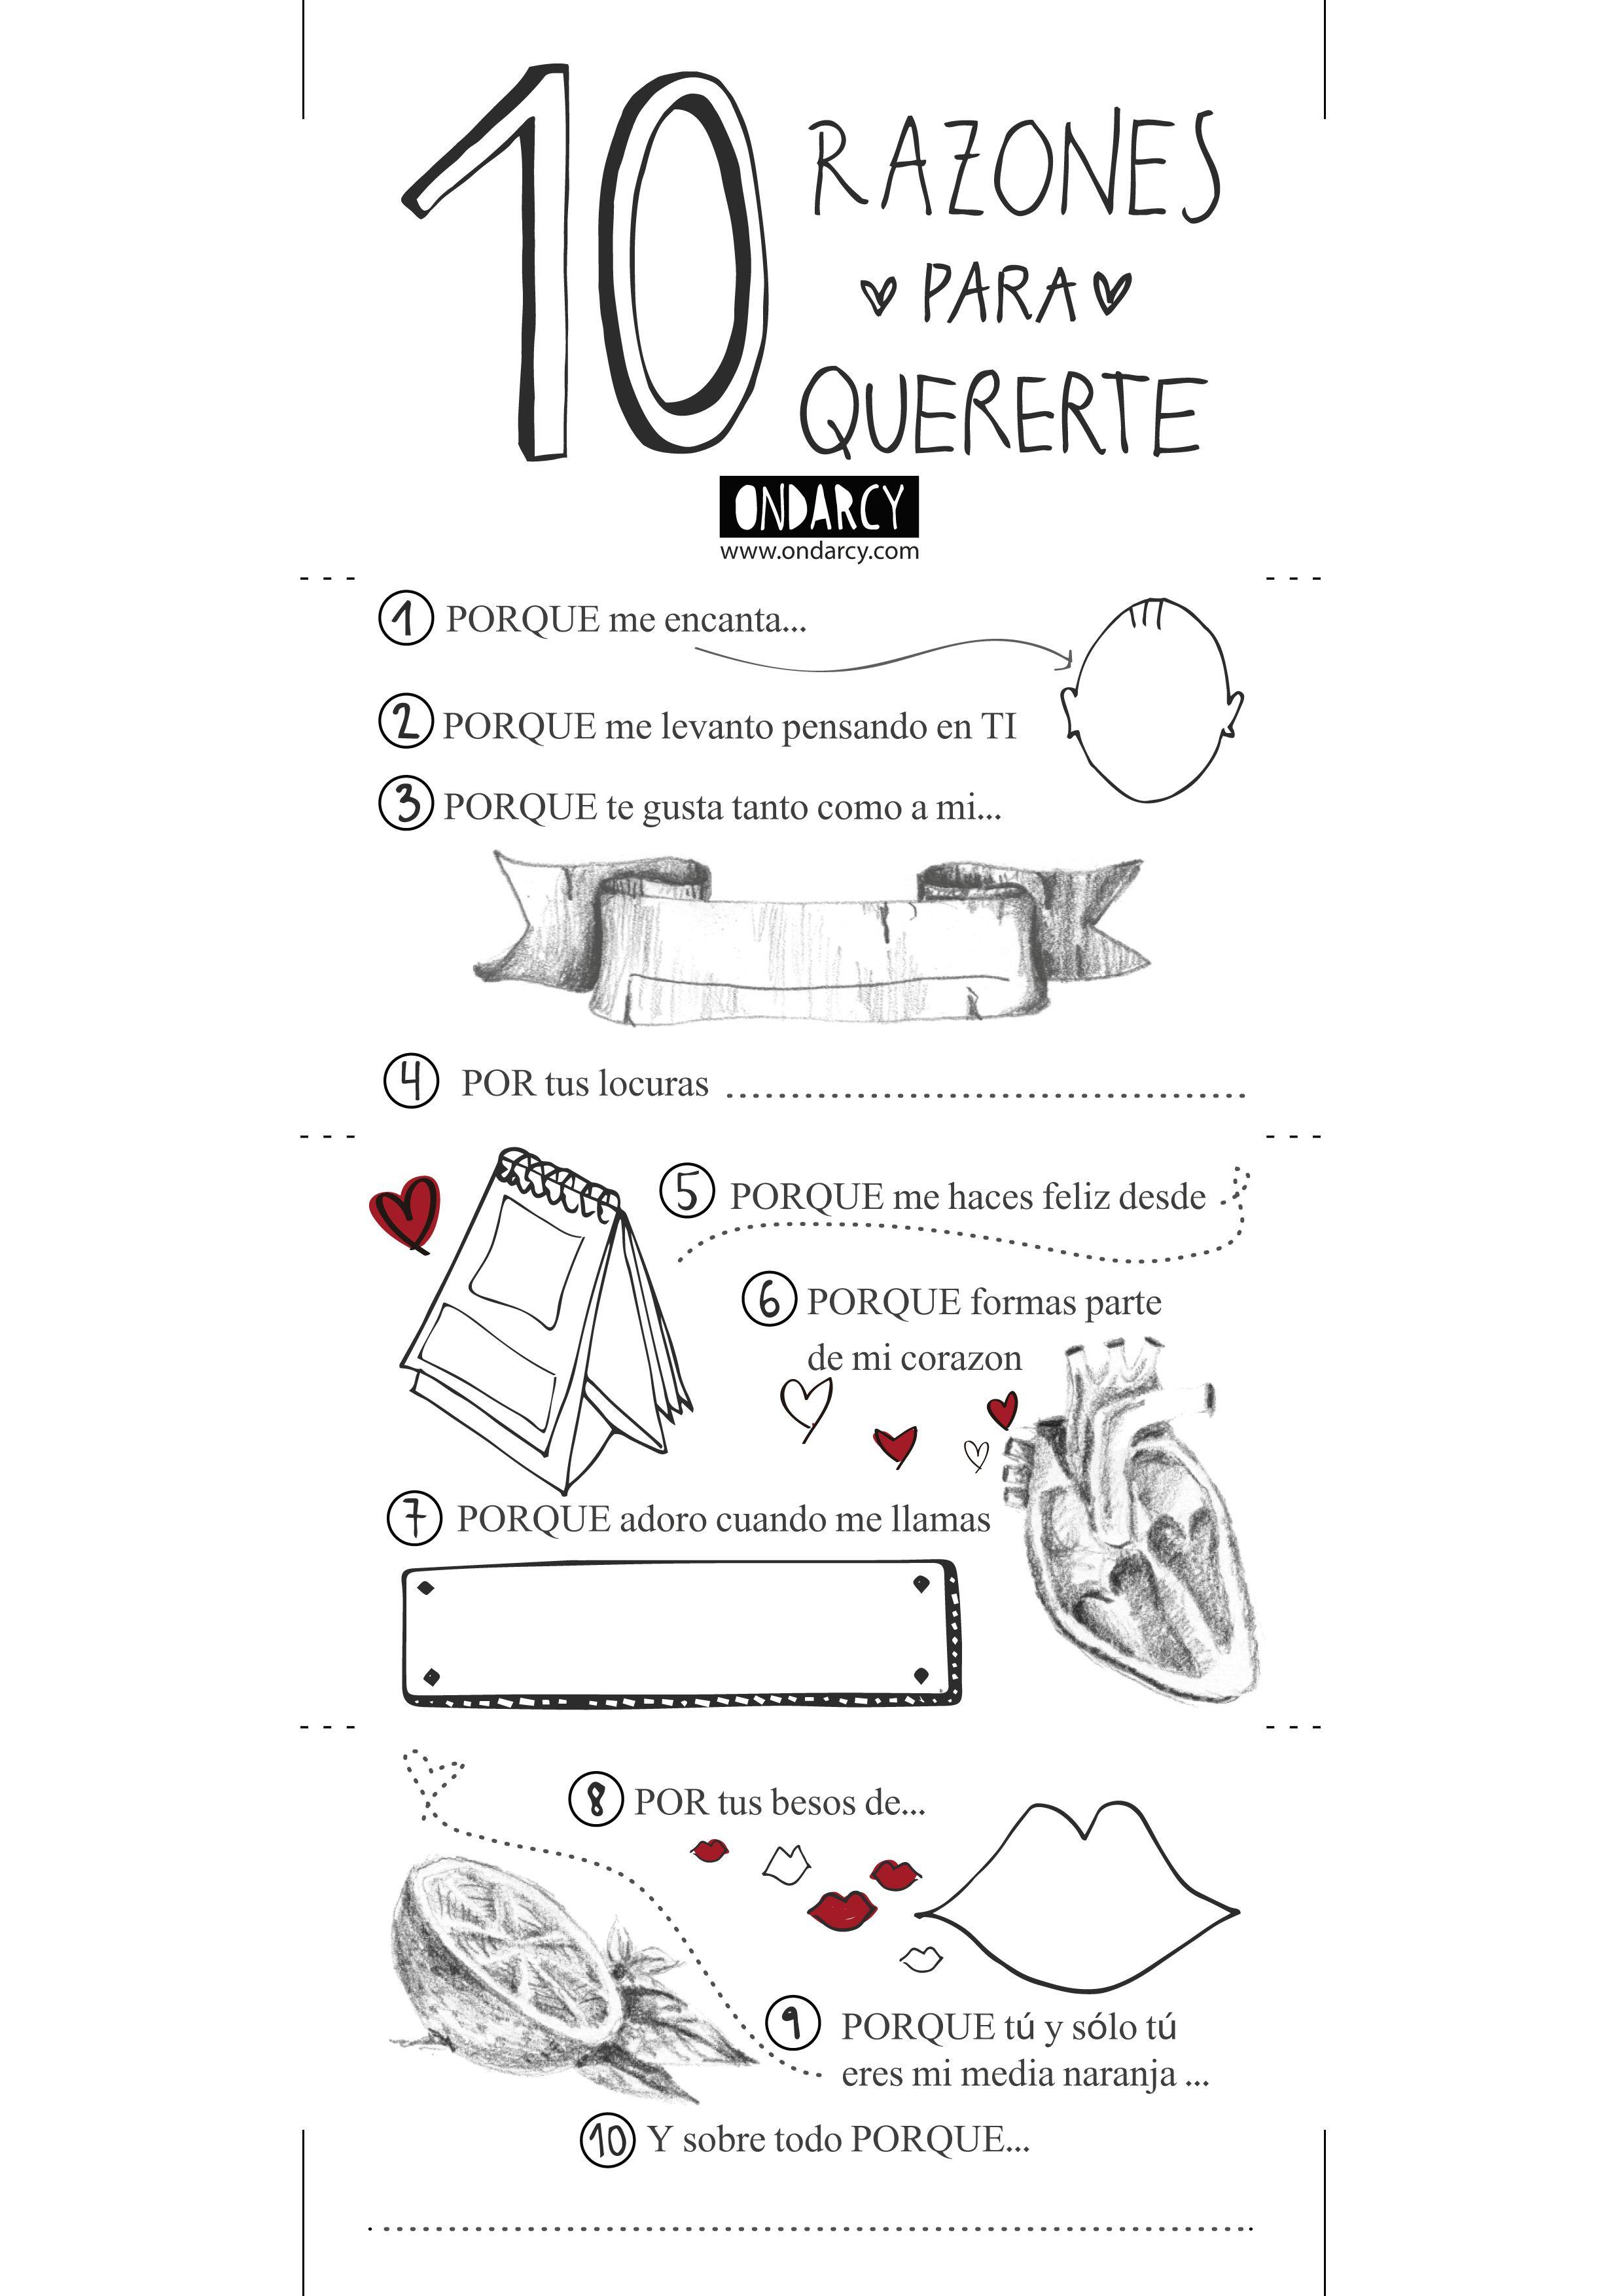 San Valentin 2015 Razones Para Quererte Sorpresas Para Tu